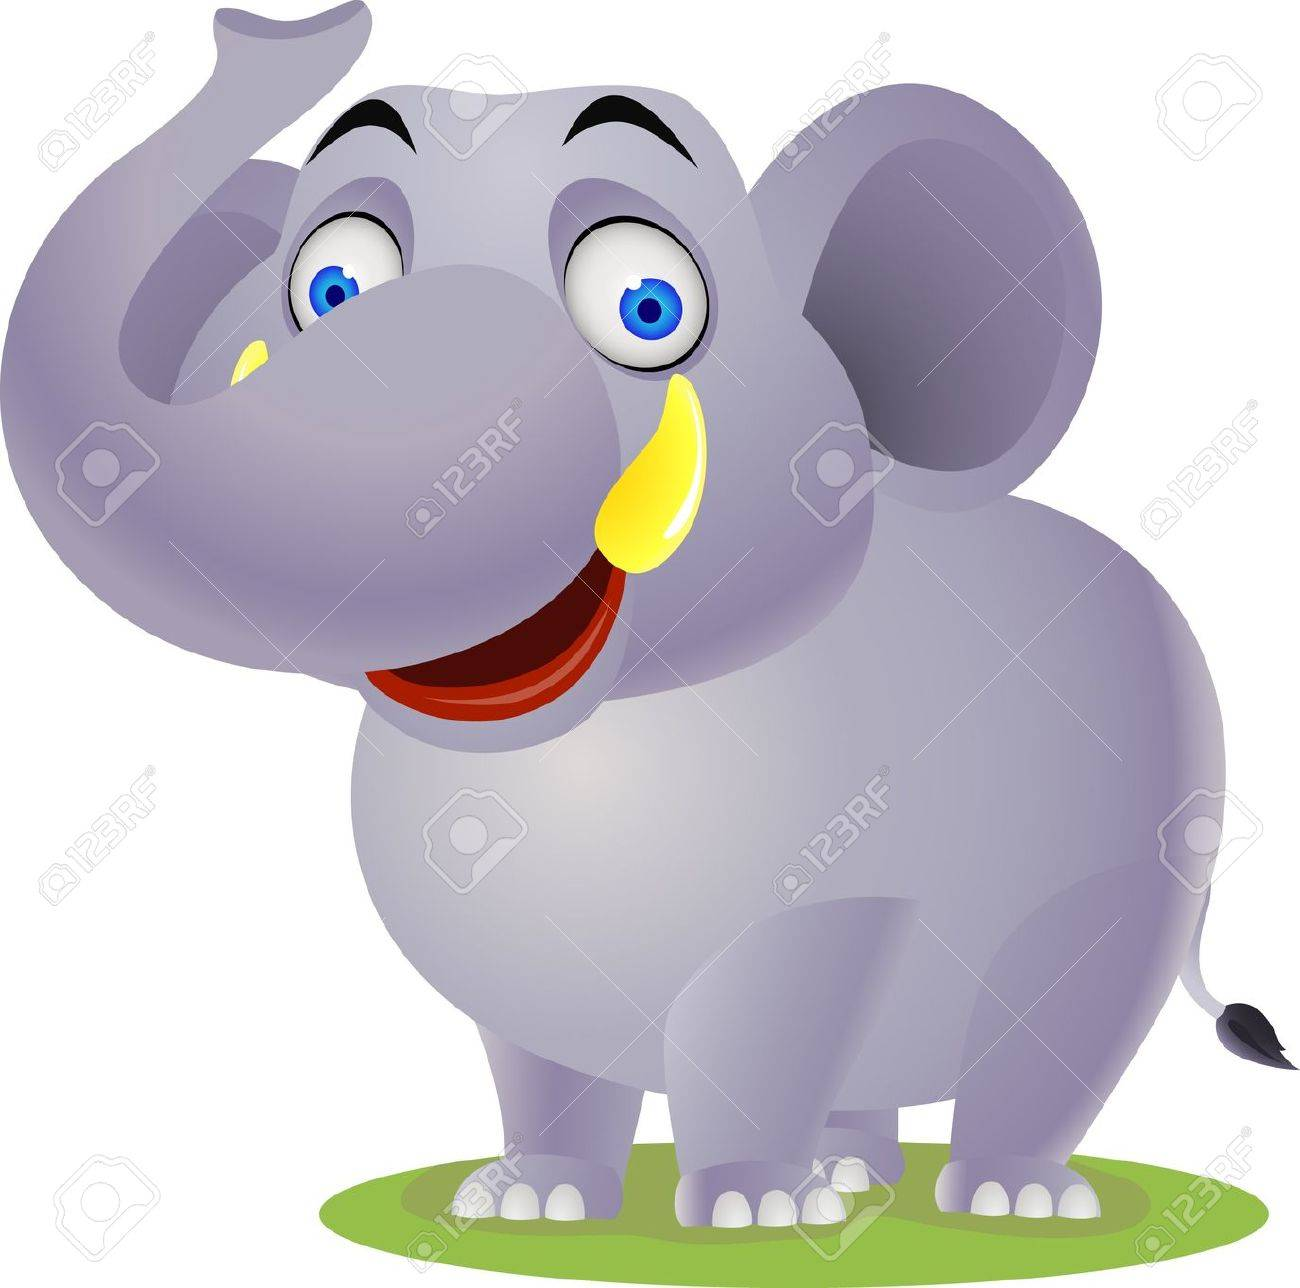 Elephant cartoon Stock Vector - 9649805